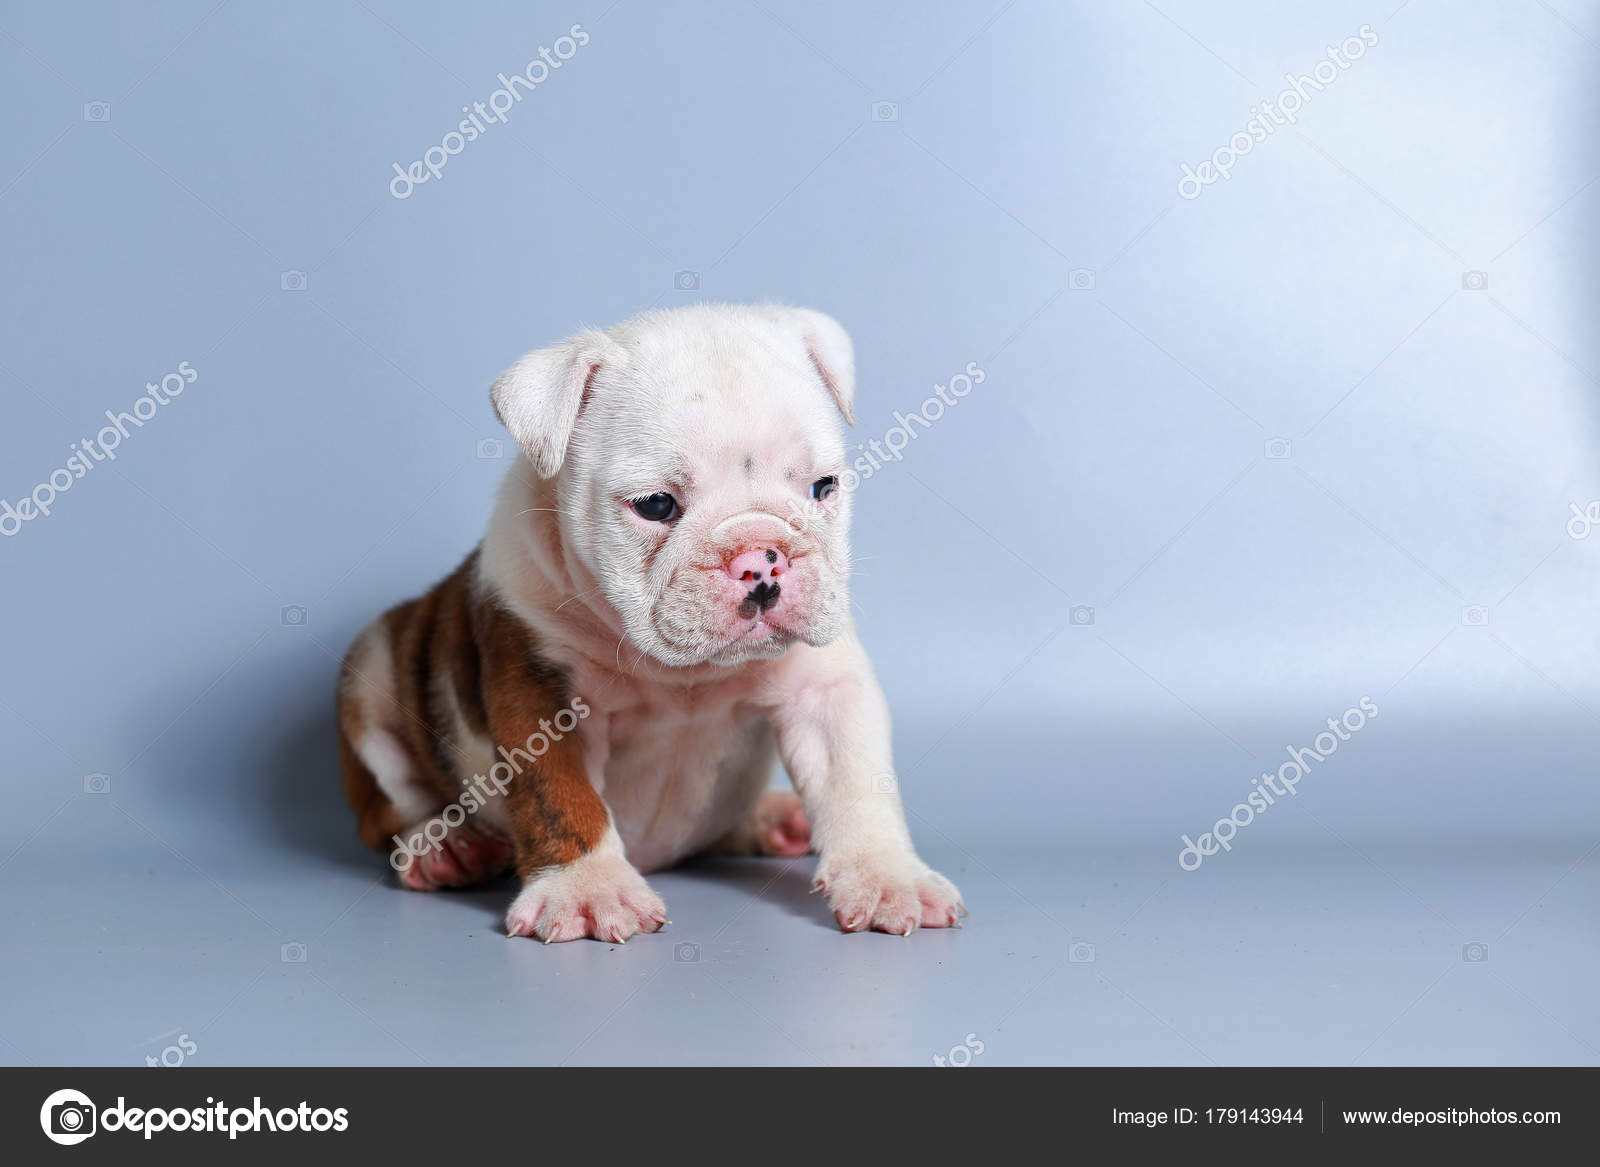 Month Purebred English Bulldog Puppy Gray Screen Stock Photo C S Thanawathreborn Gmail Com 179143944